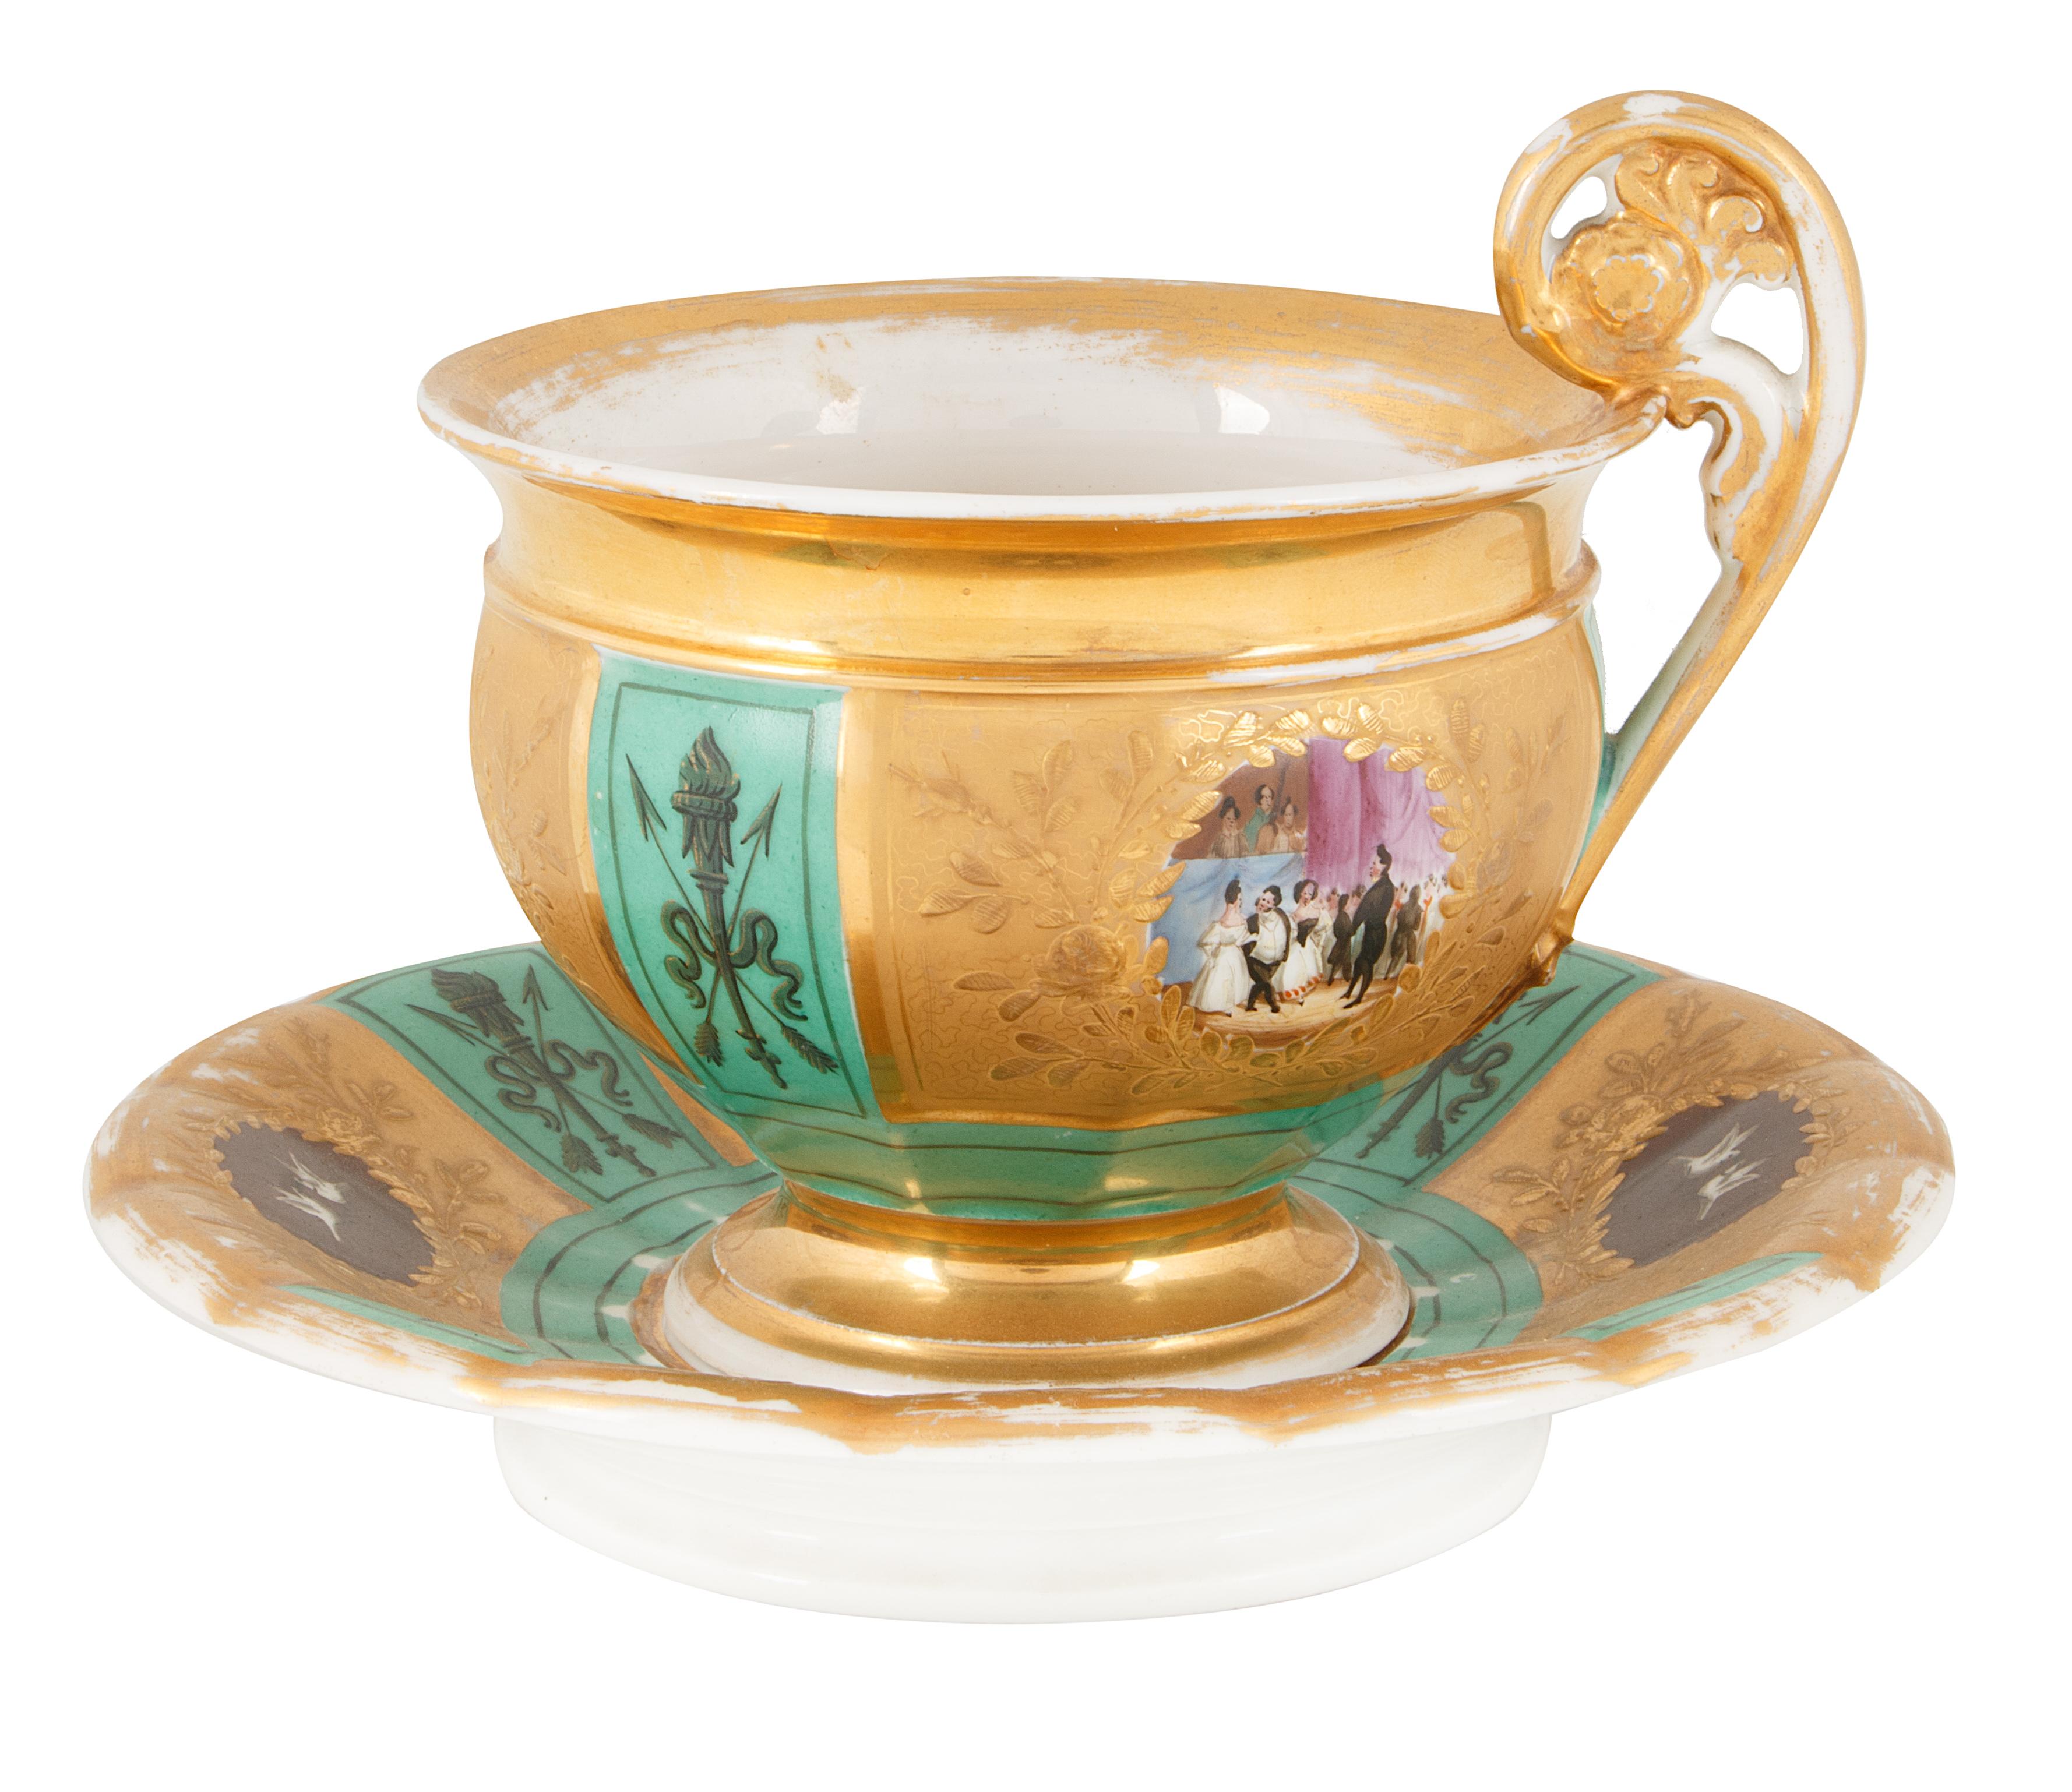 19TH CENTURY GILT PORCELAIN TEA CUP AND SAUCER